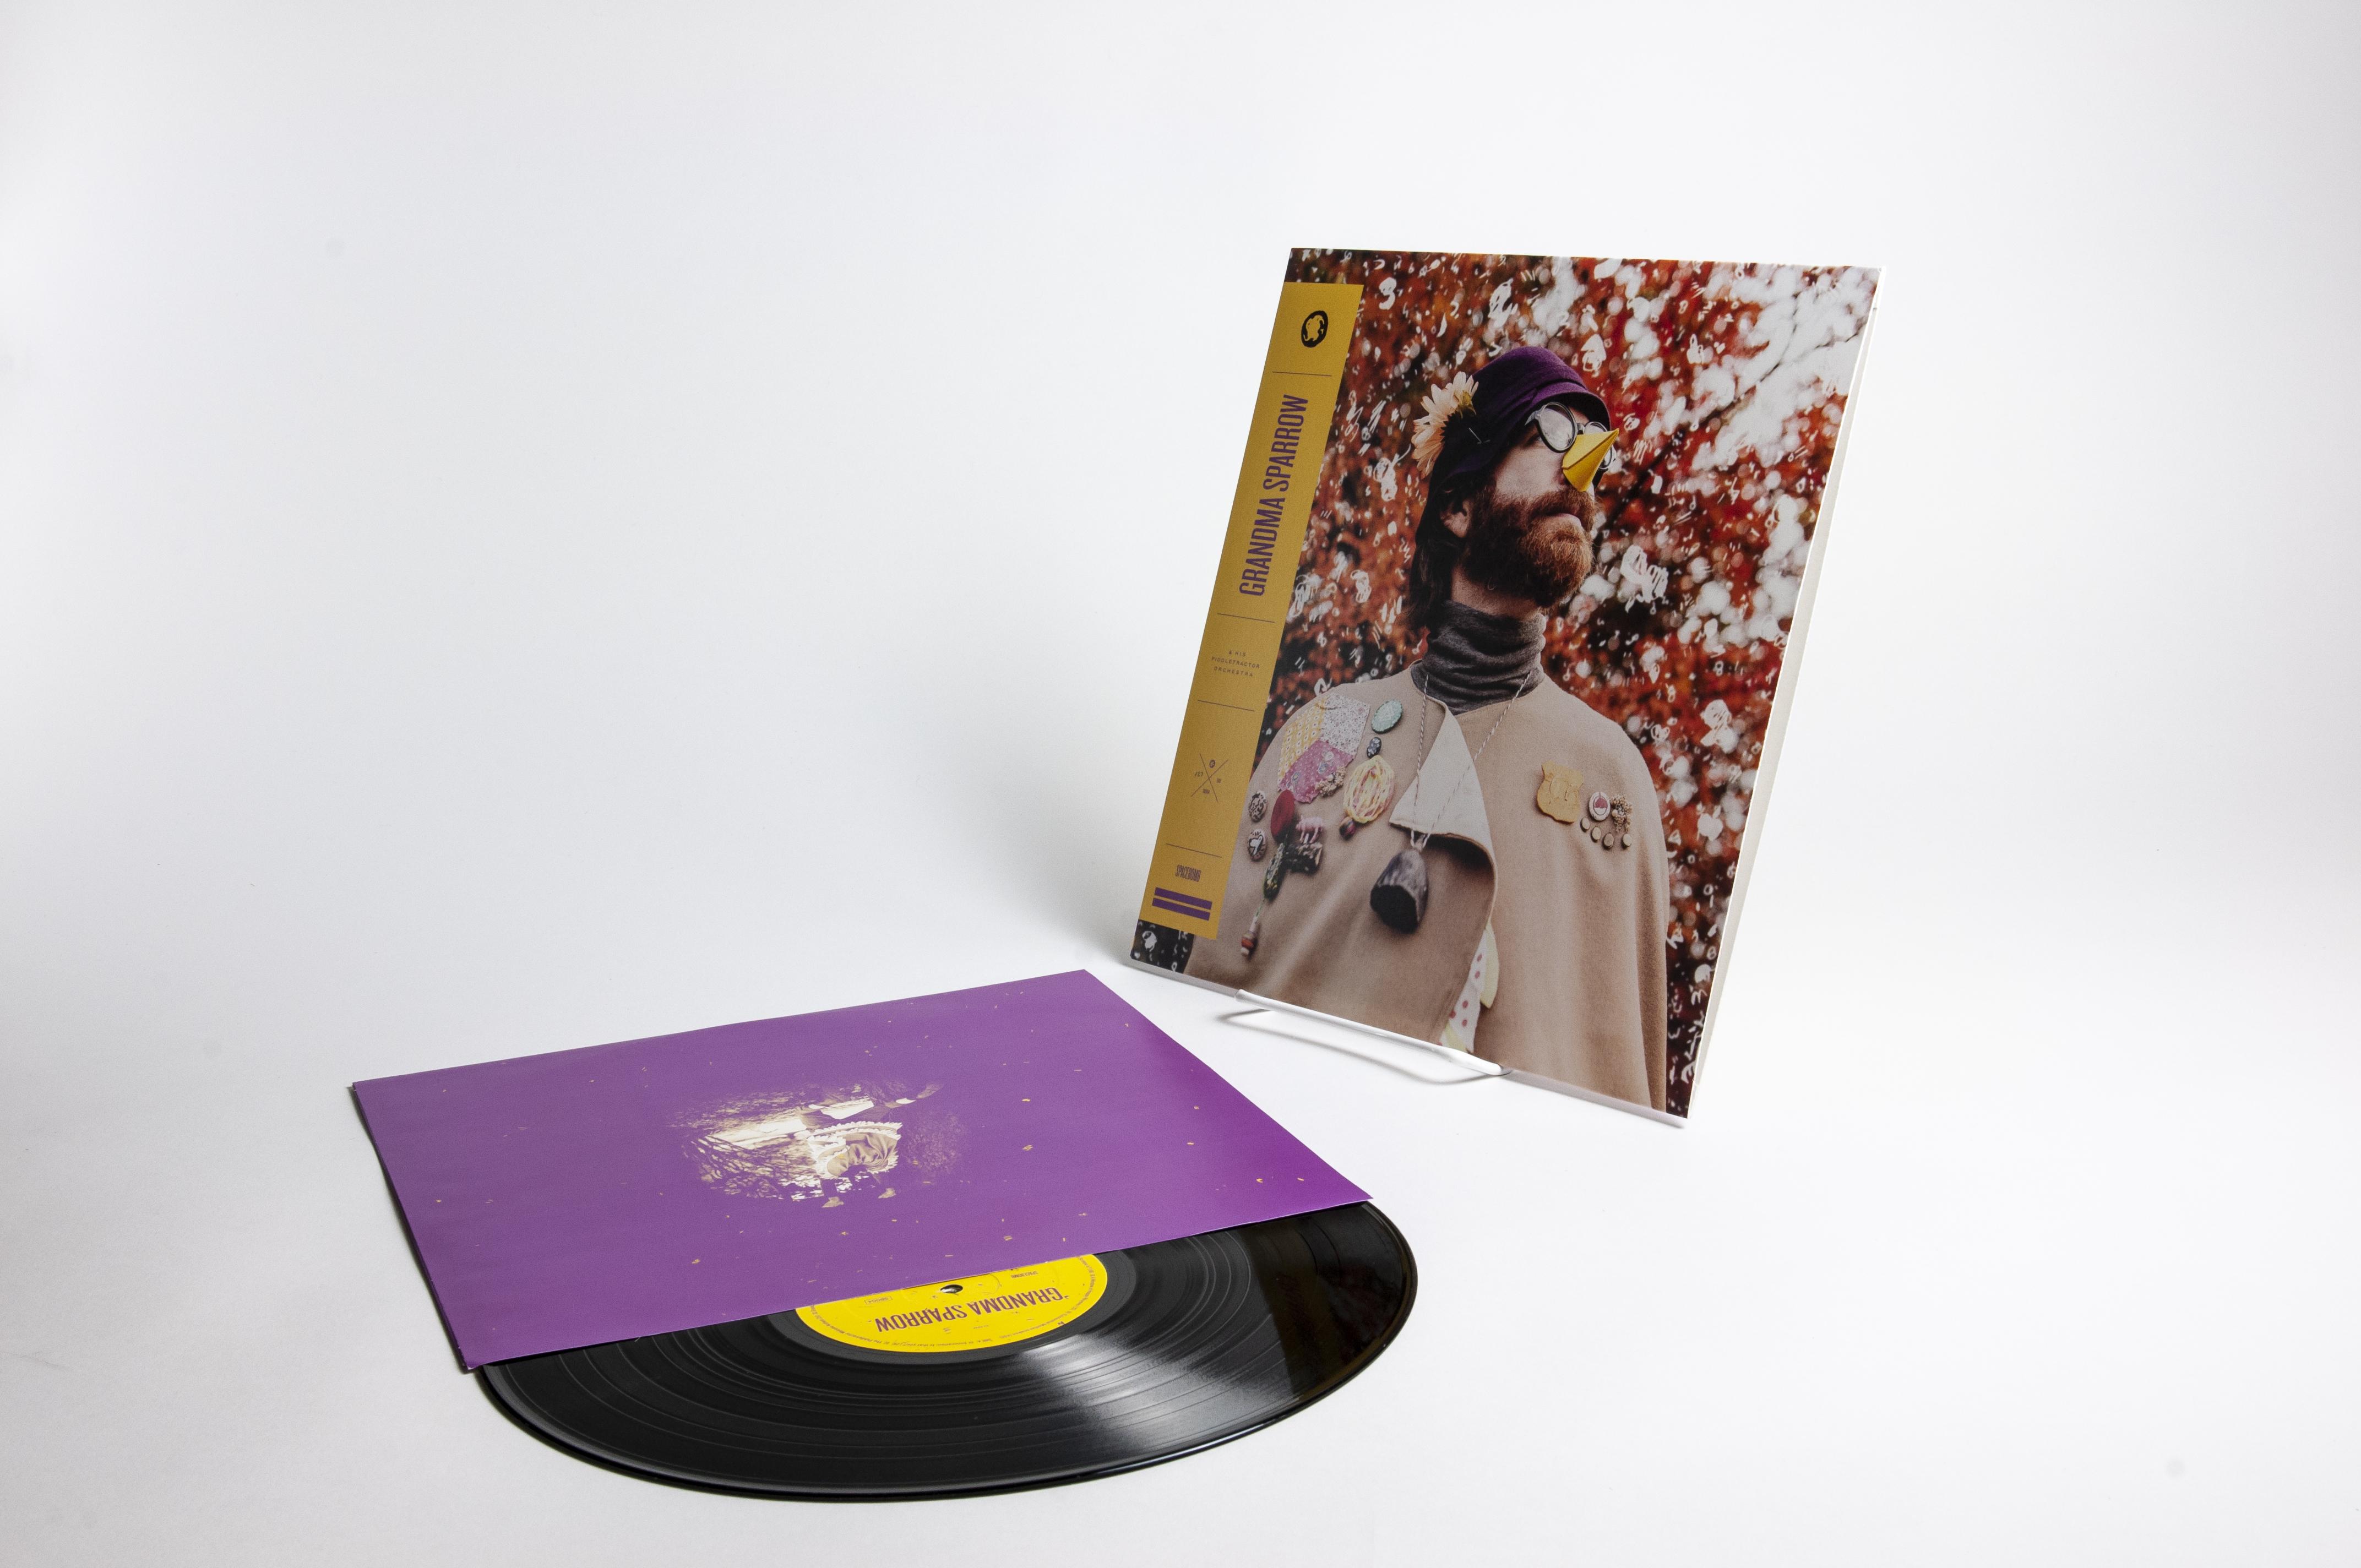 Grandma Sparrow & his Piddletractor Orchestra – Vinyl - Spacebomb Records